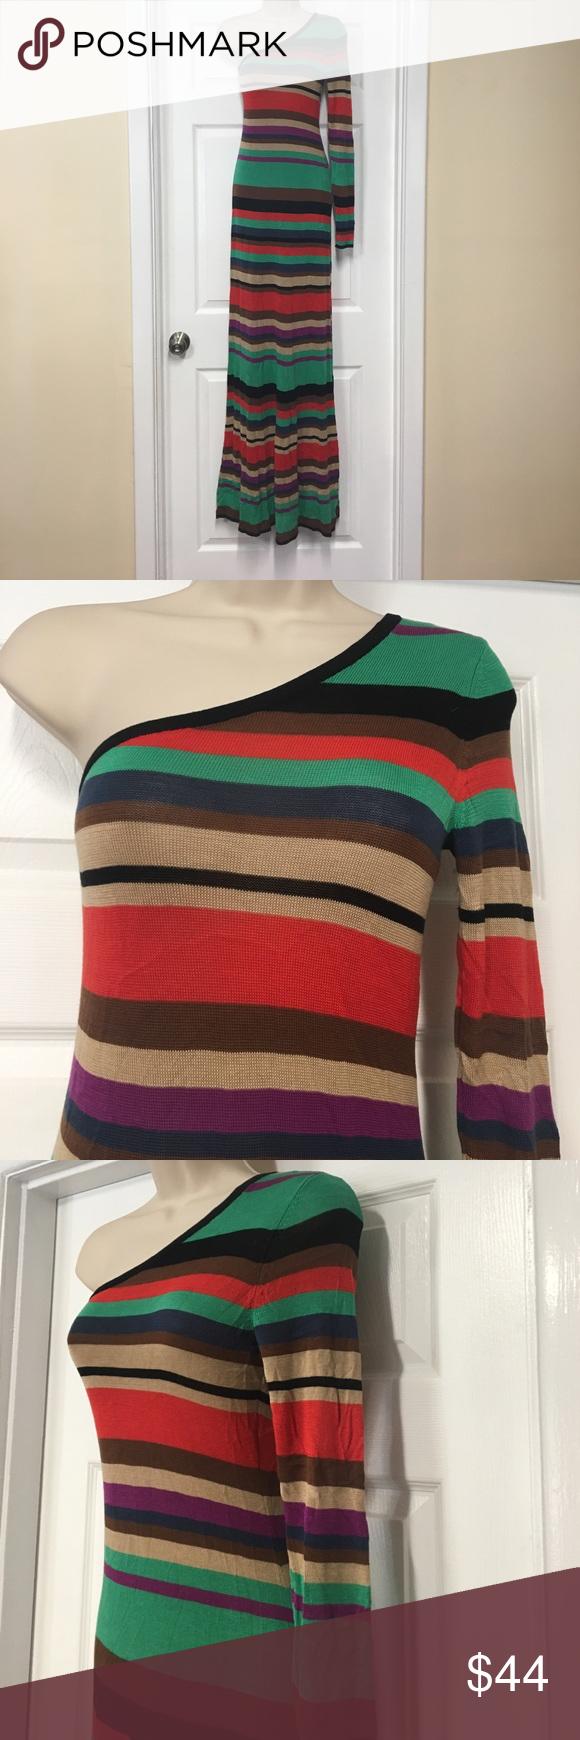 BCBG one shoulder multi color striped maxi dress Very beautiful and elegant multicolored striped maxi dress. One shoulder design thin sweater material. Perfect for any season. BCBGMaxAzria Dresses Maxi